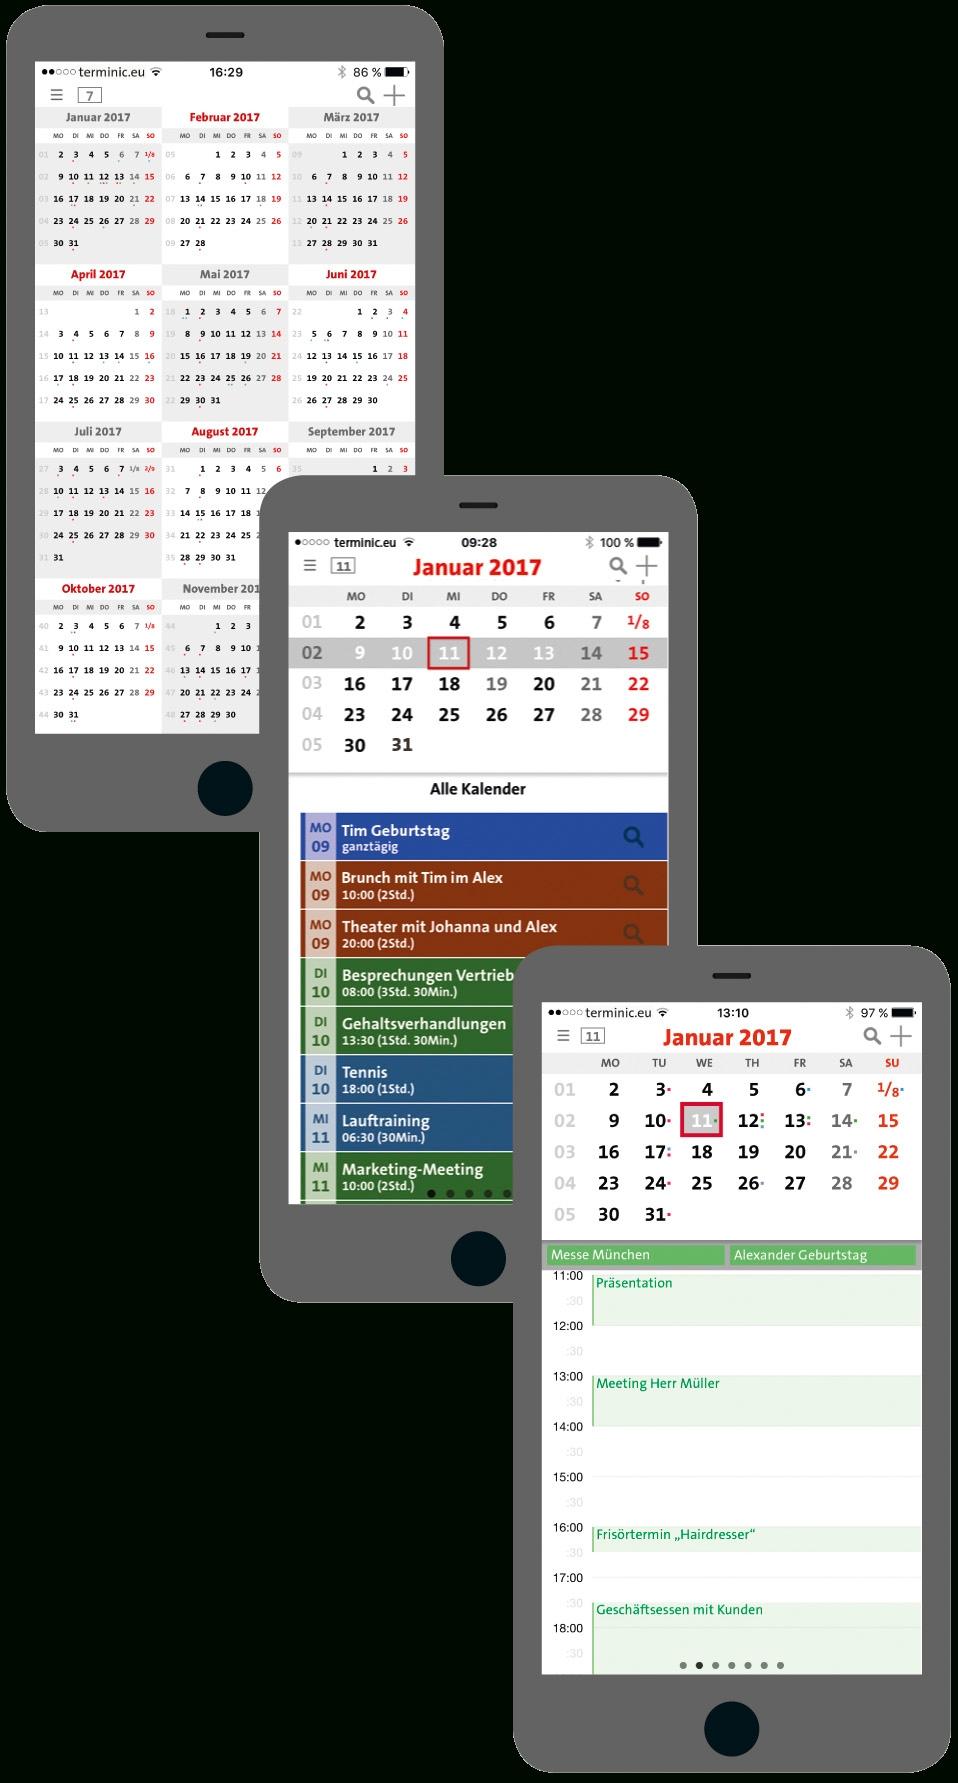 Terminic 3-Month-Calendar-App For Ios And Android - Download with Download A 3 Month Calendar